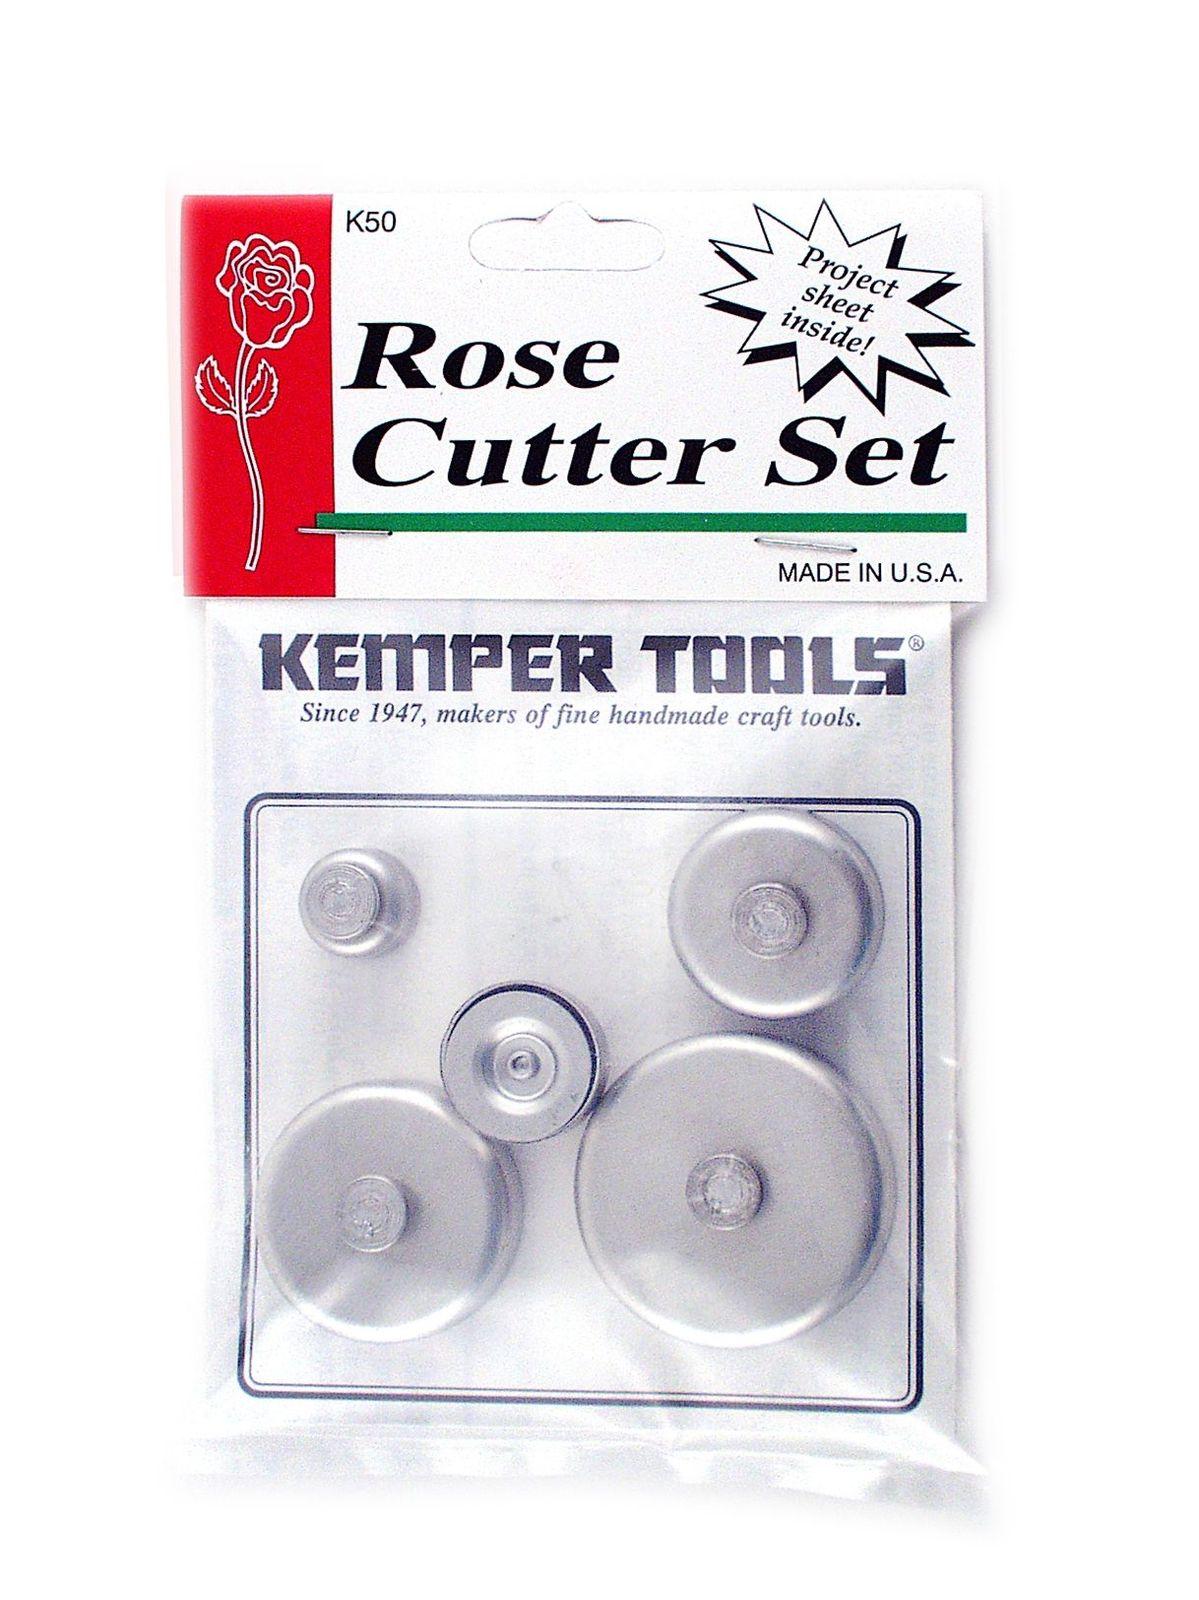 Rose Cutter Set